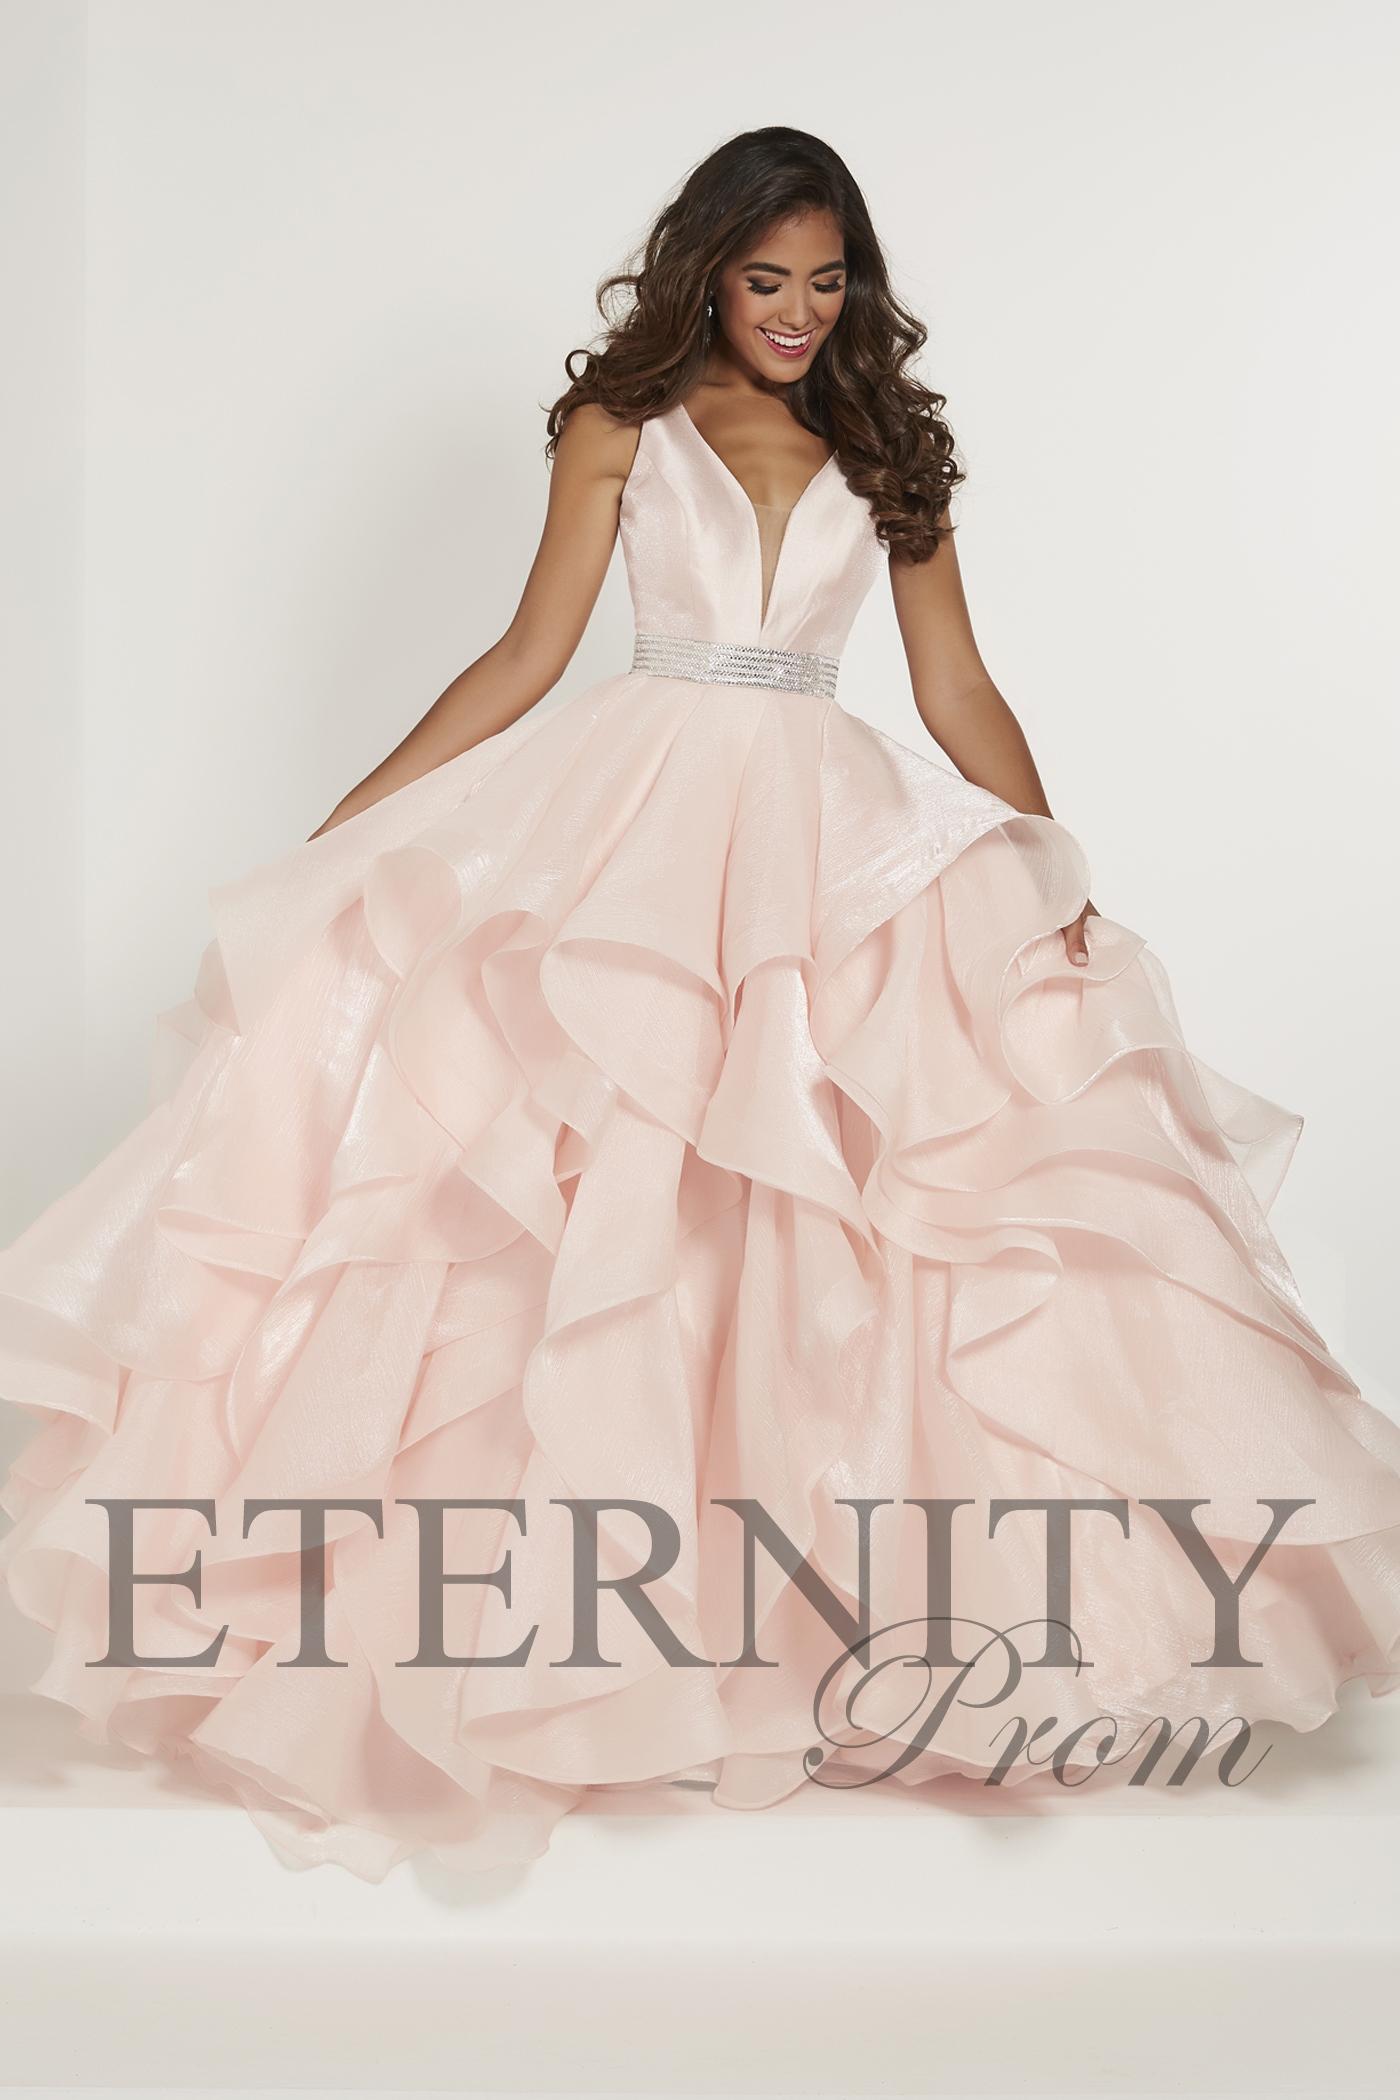 Eternity Prom 46158 Peach - Ladida Boutique fe0aaf61a